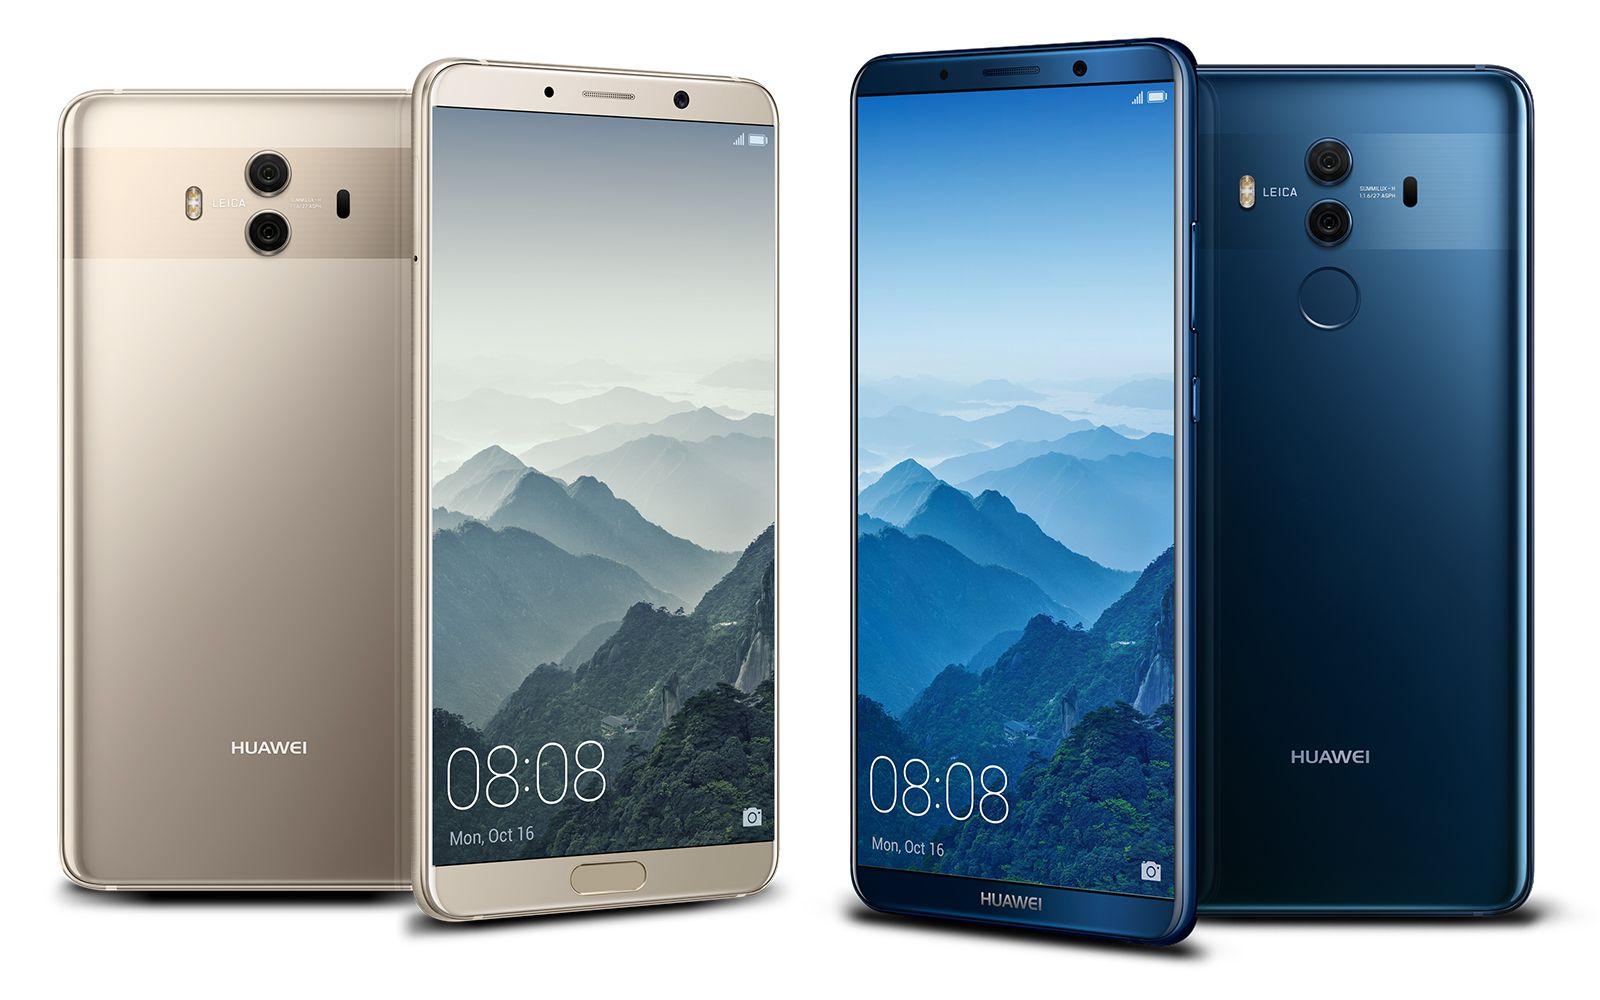 Huawei Mate 10/Mate 10 Proに搭載されている「Kirin 970」のAnTuTuベンチマーク結果が公開